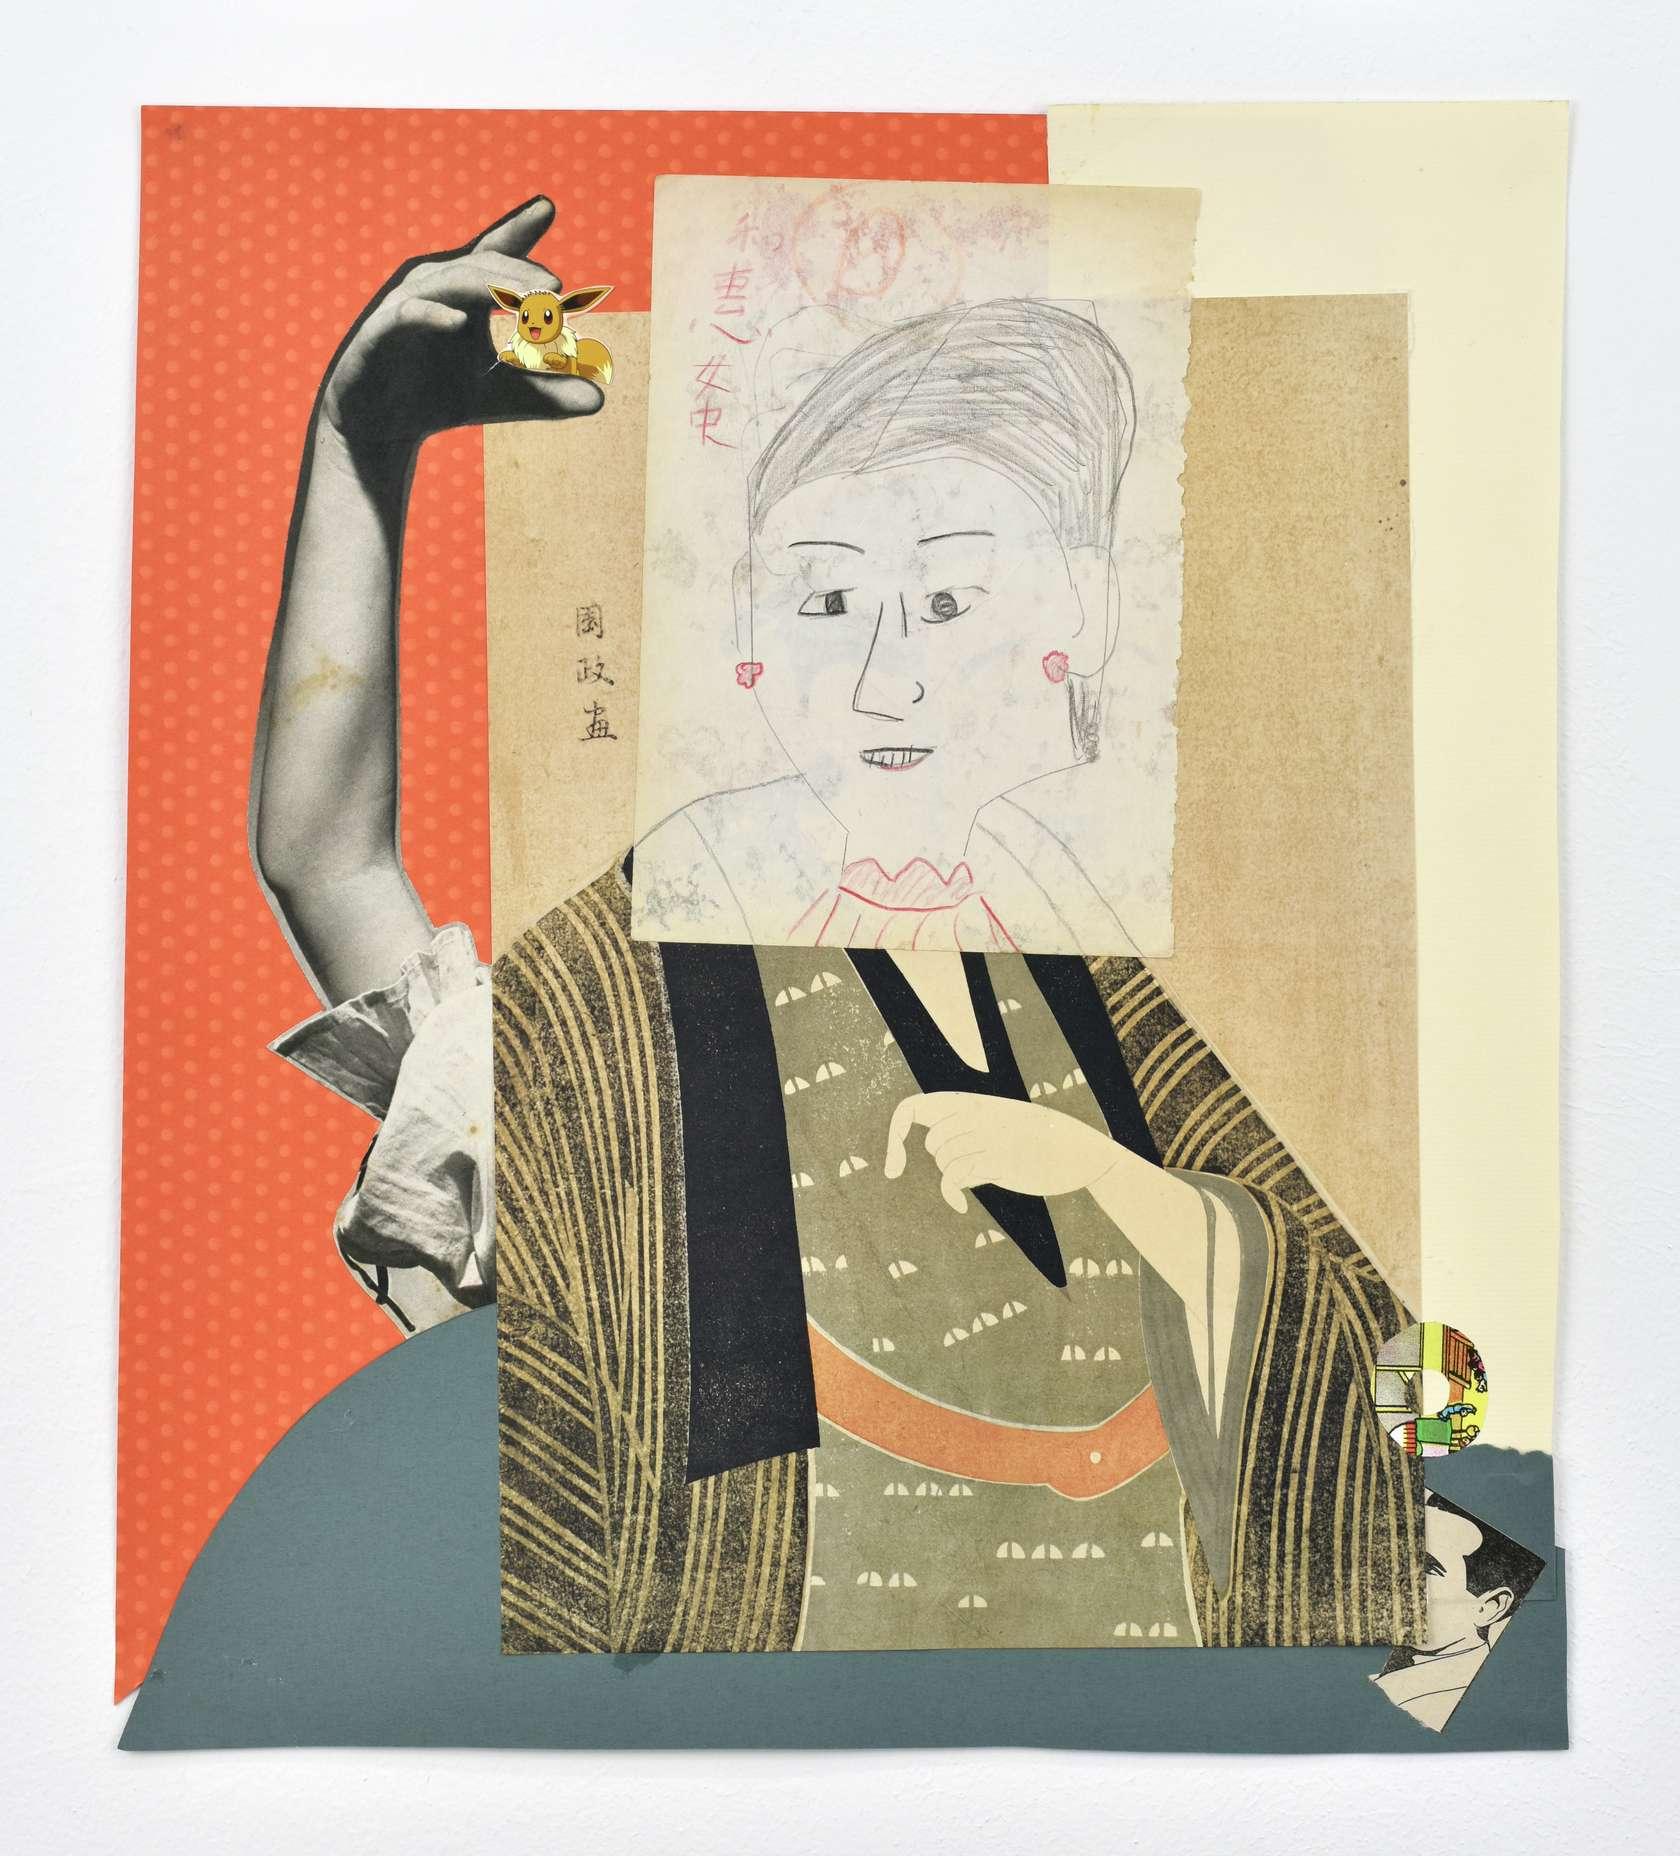 Hippolyte Hentgen, Sanjo Dori, 2018 Collage sur papier44.5 × 39.5 cm / 17 1/2 × 15 1/2 in.